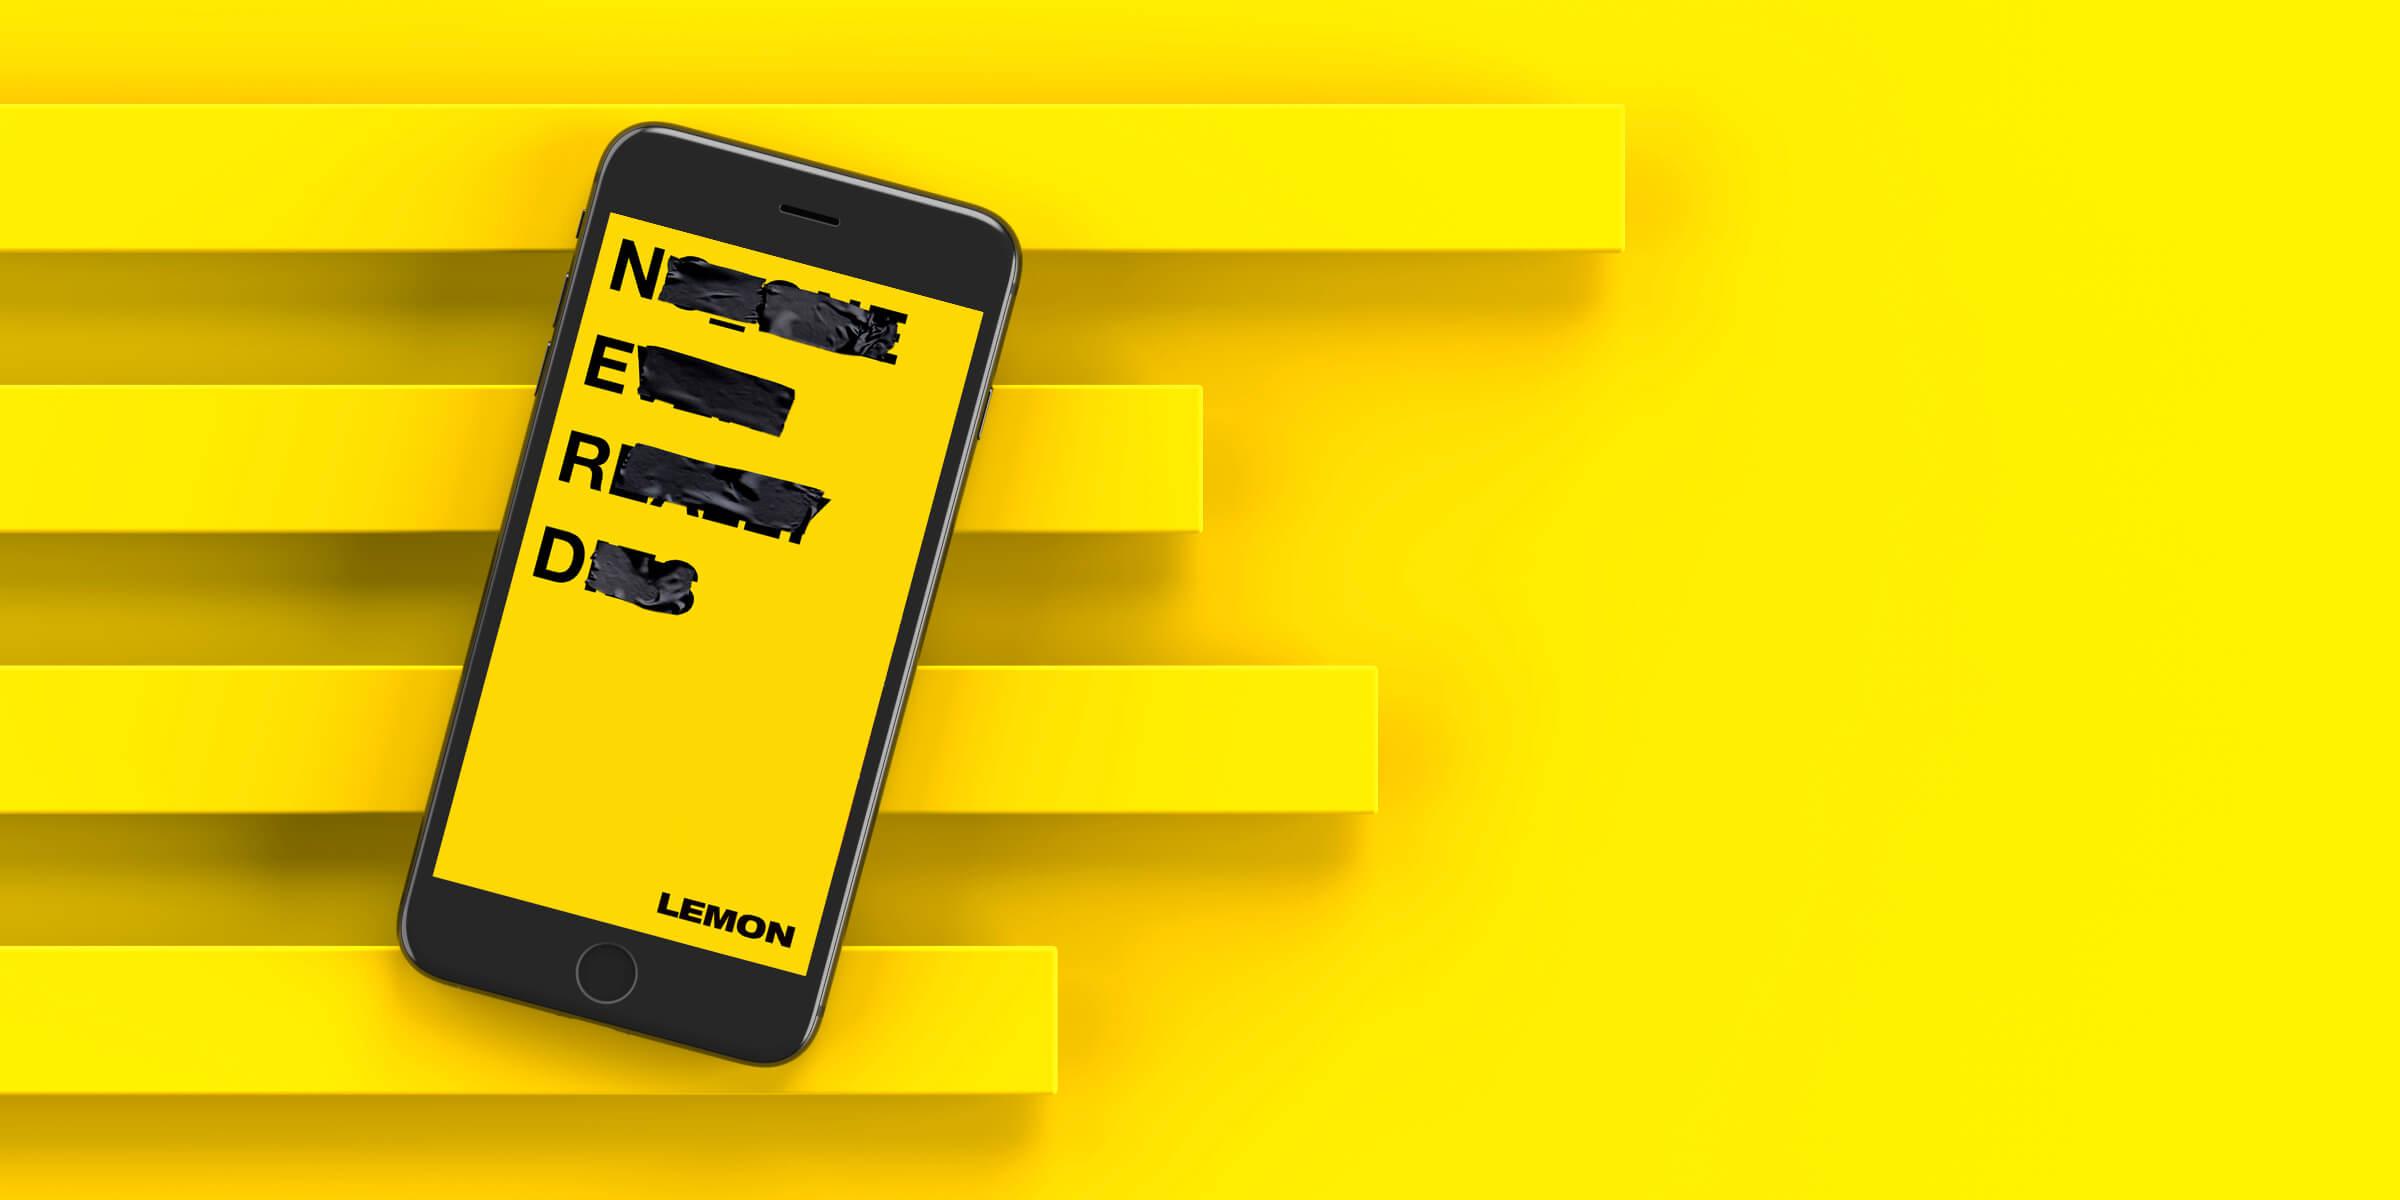 "Remix N.E.R.D.'s new single ""Lemon"" with new ROLI Studiopack"